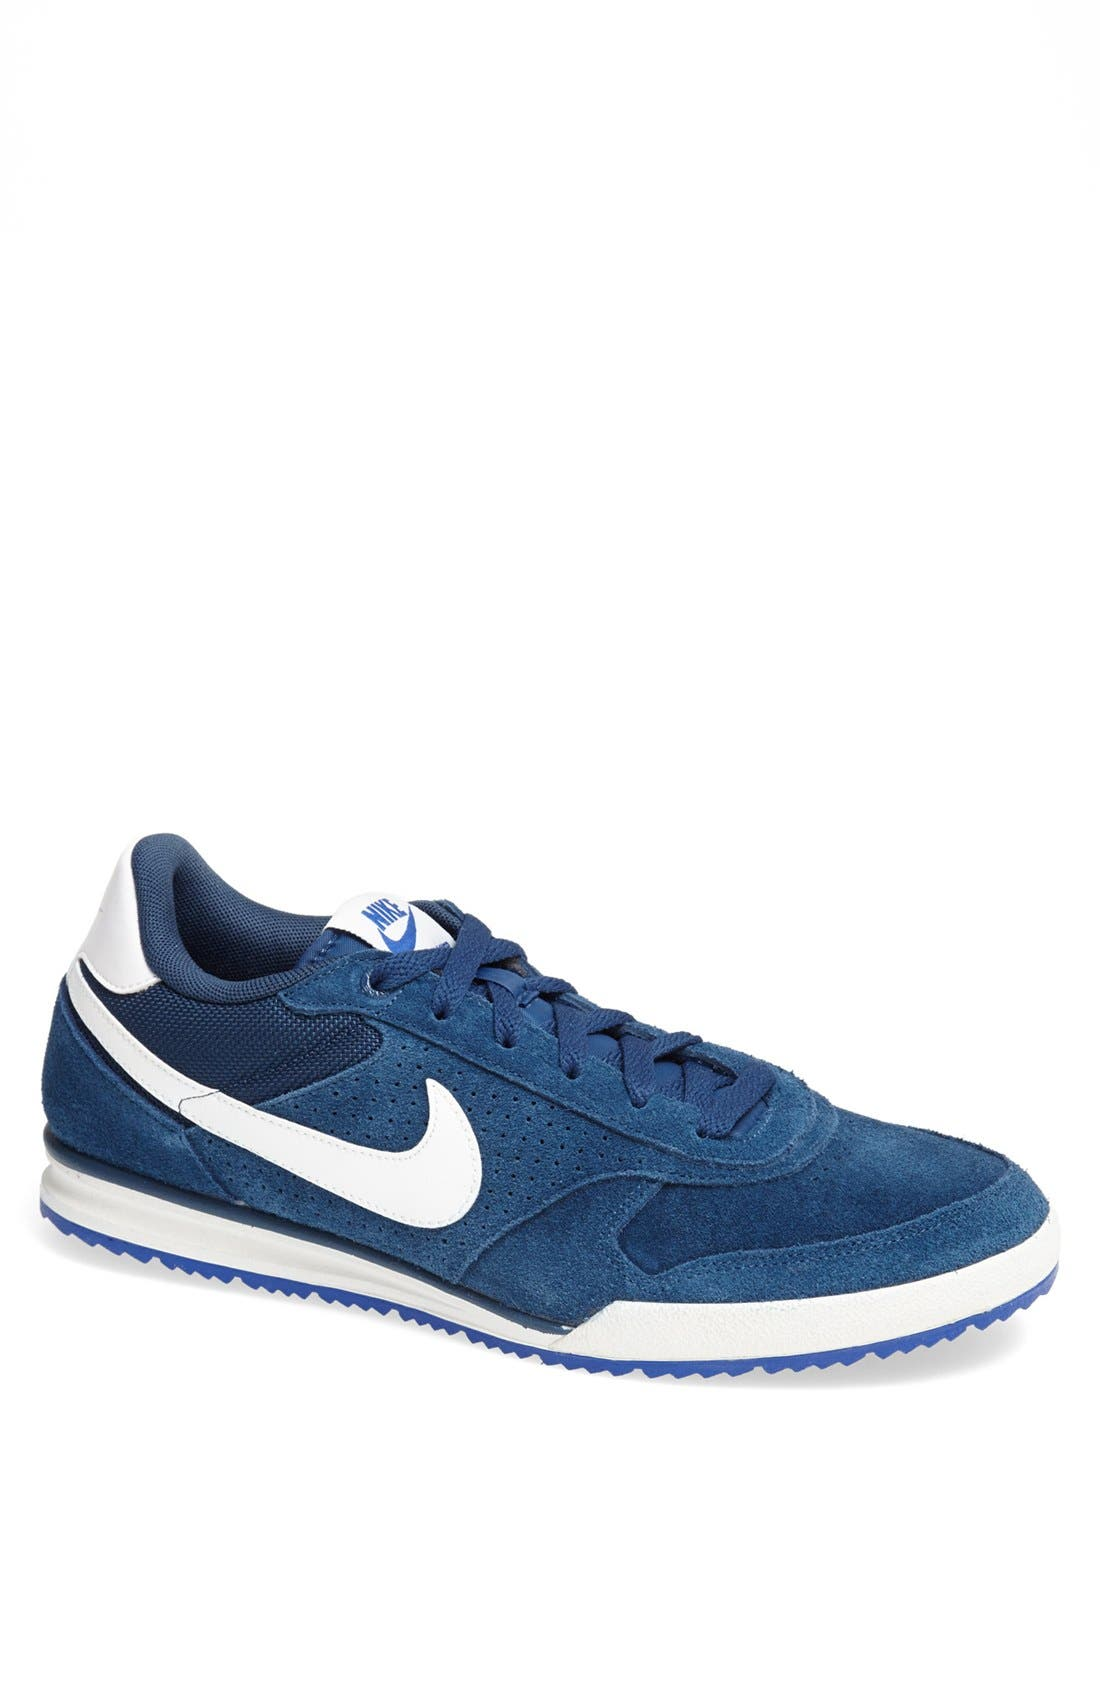 Alternate Image 1 Selected - Nike 'Field Trainer' Sneaker (Men)